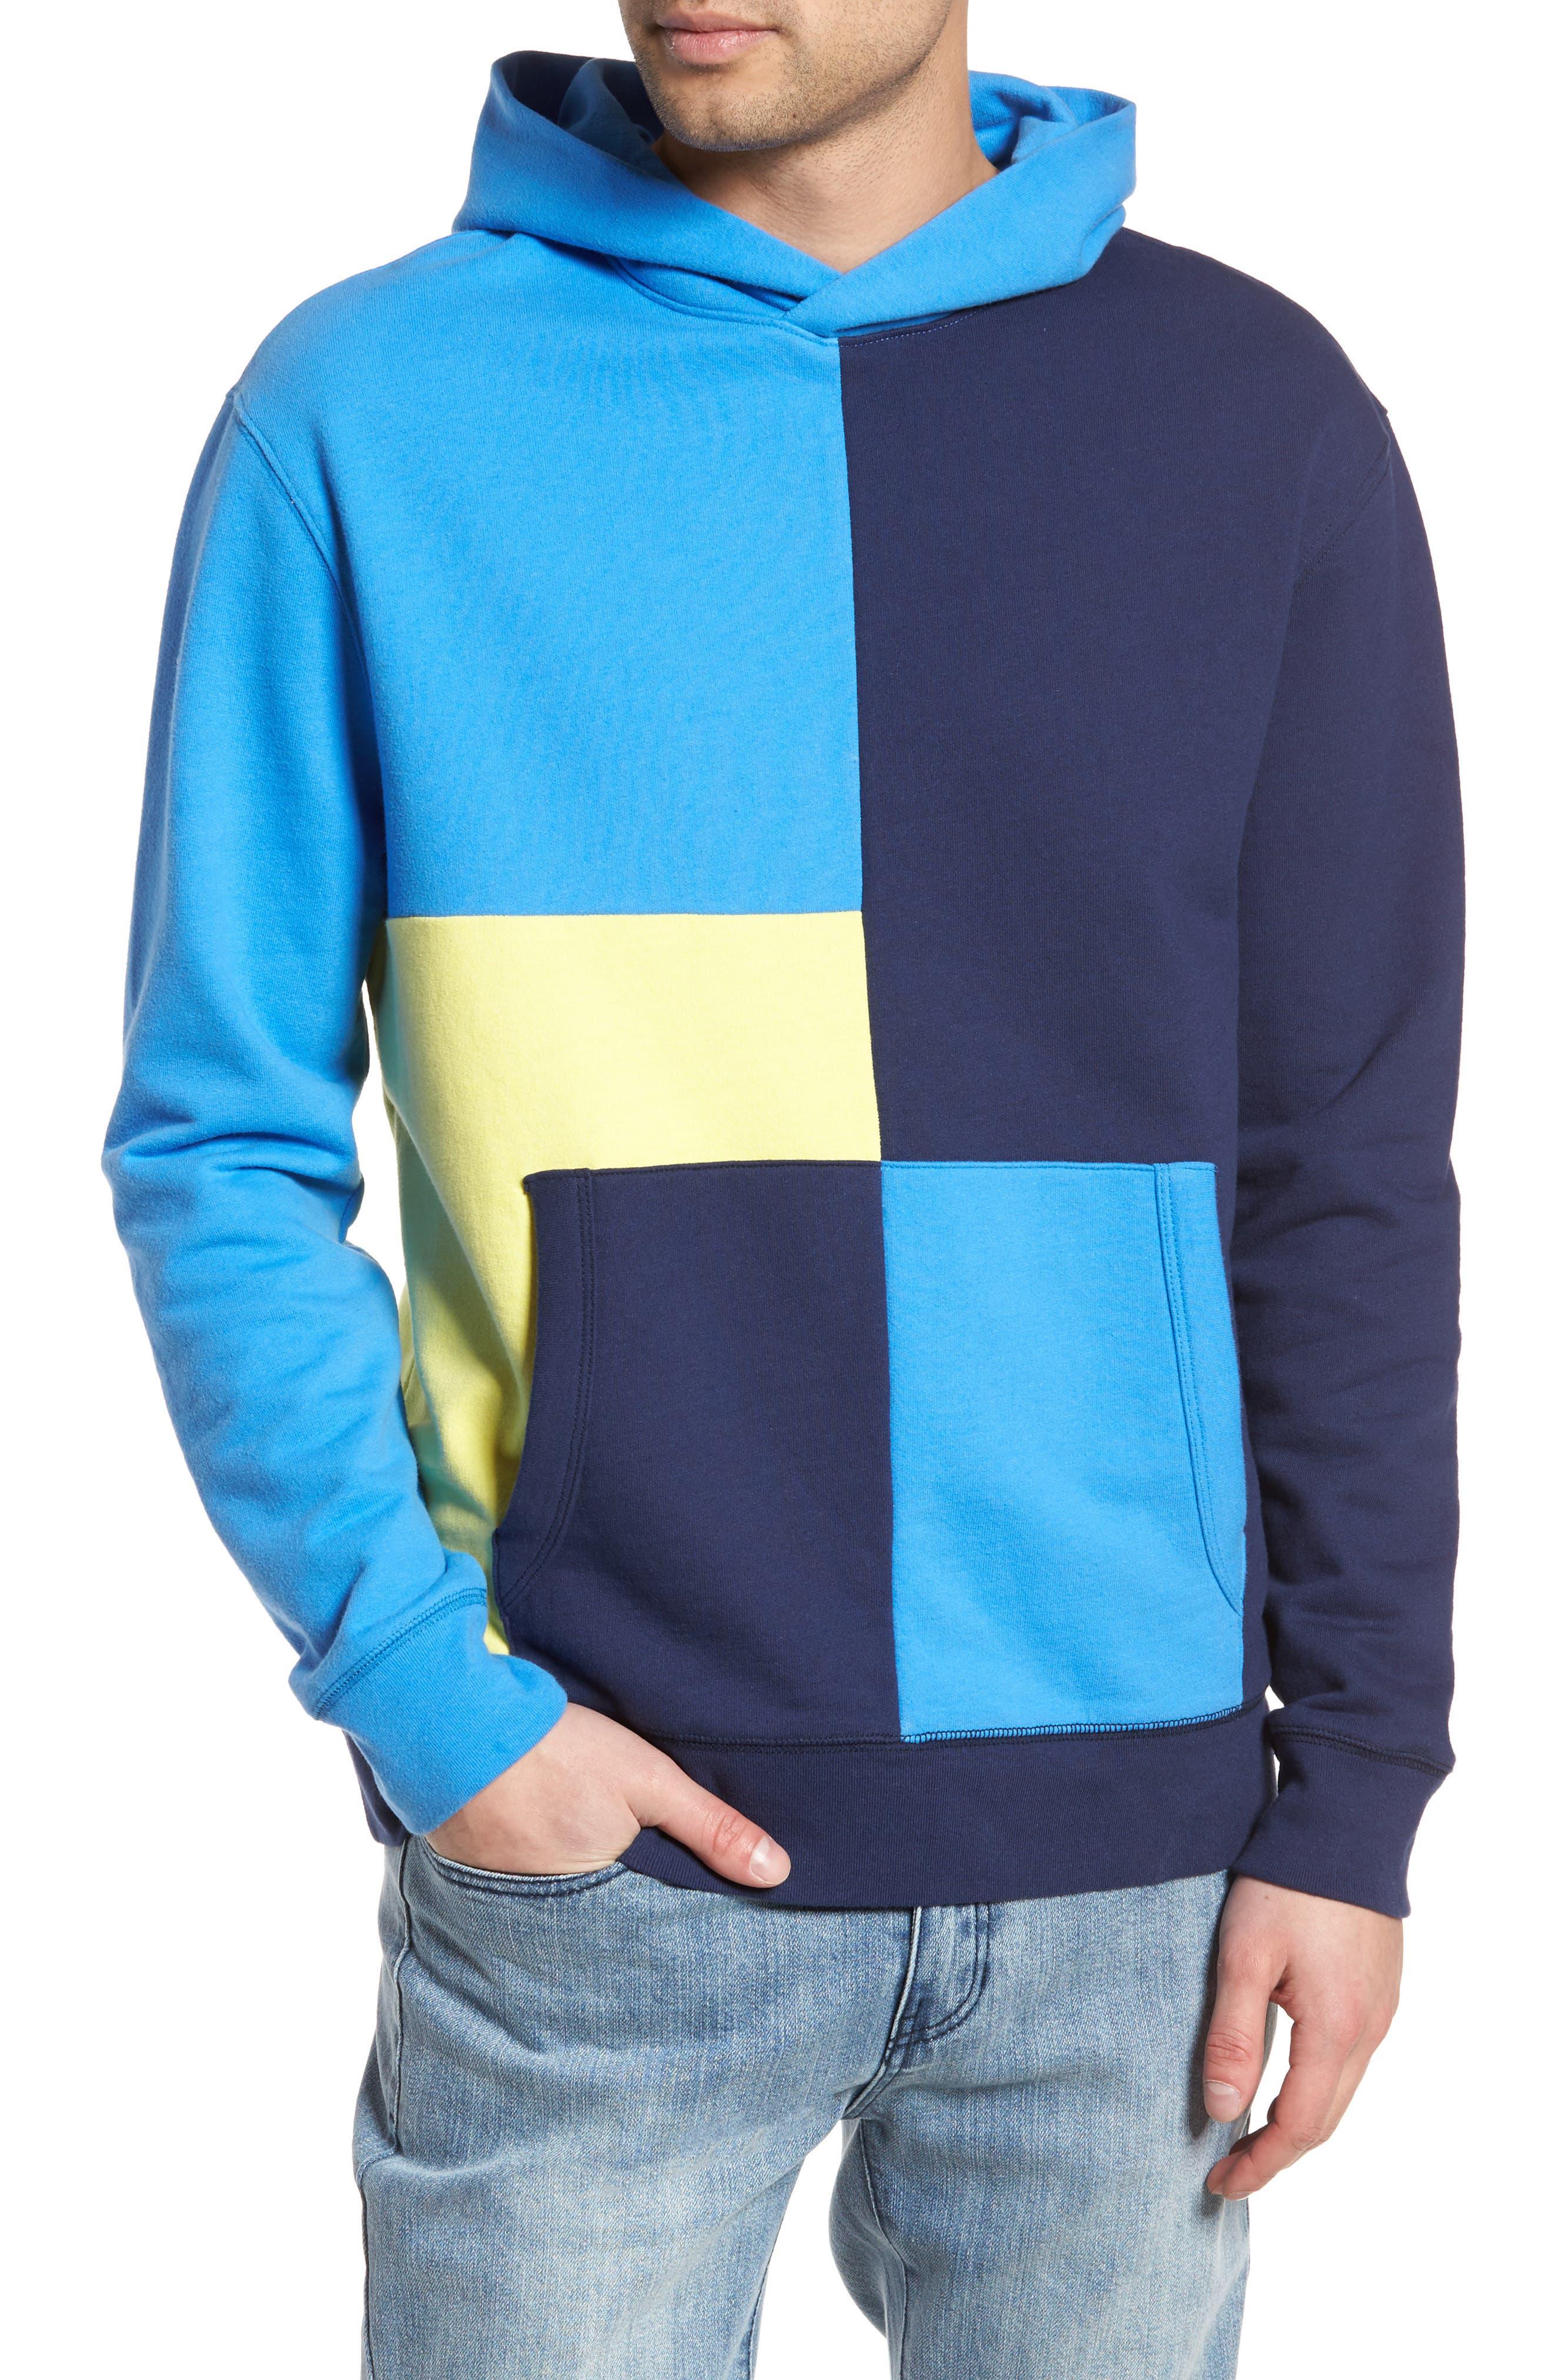 Colorblock Hoodie Sweatshirt,                             Main thumbnail 1, color,                             Navy Blue Yellow Block